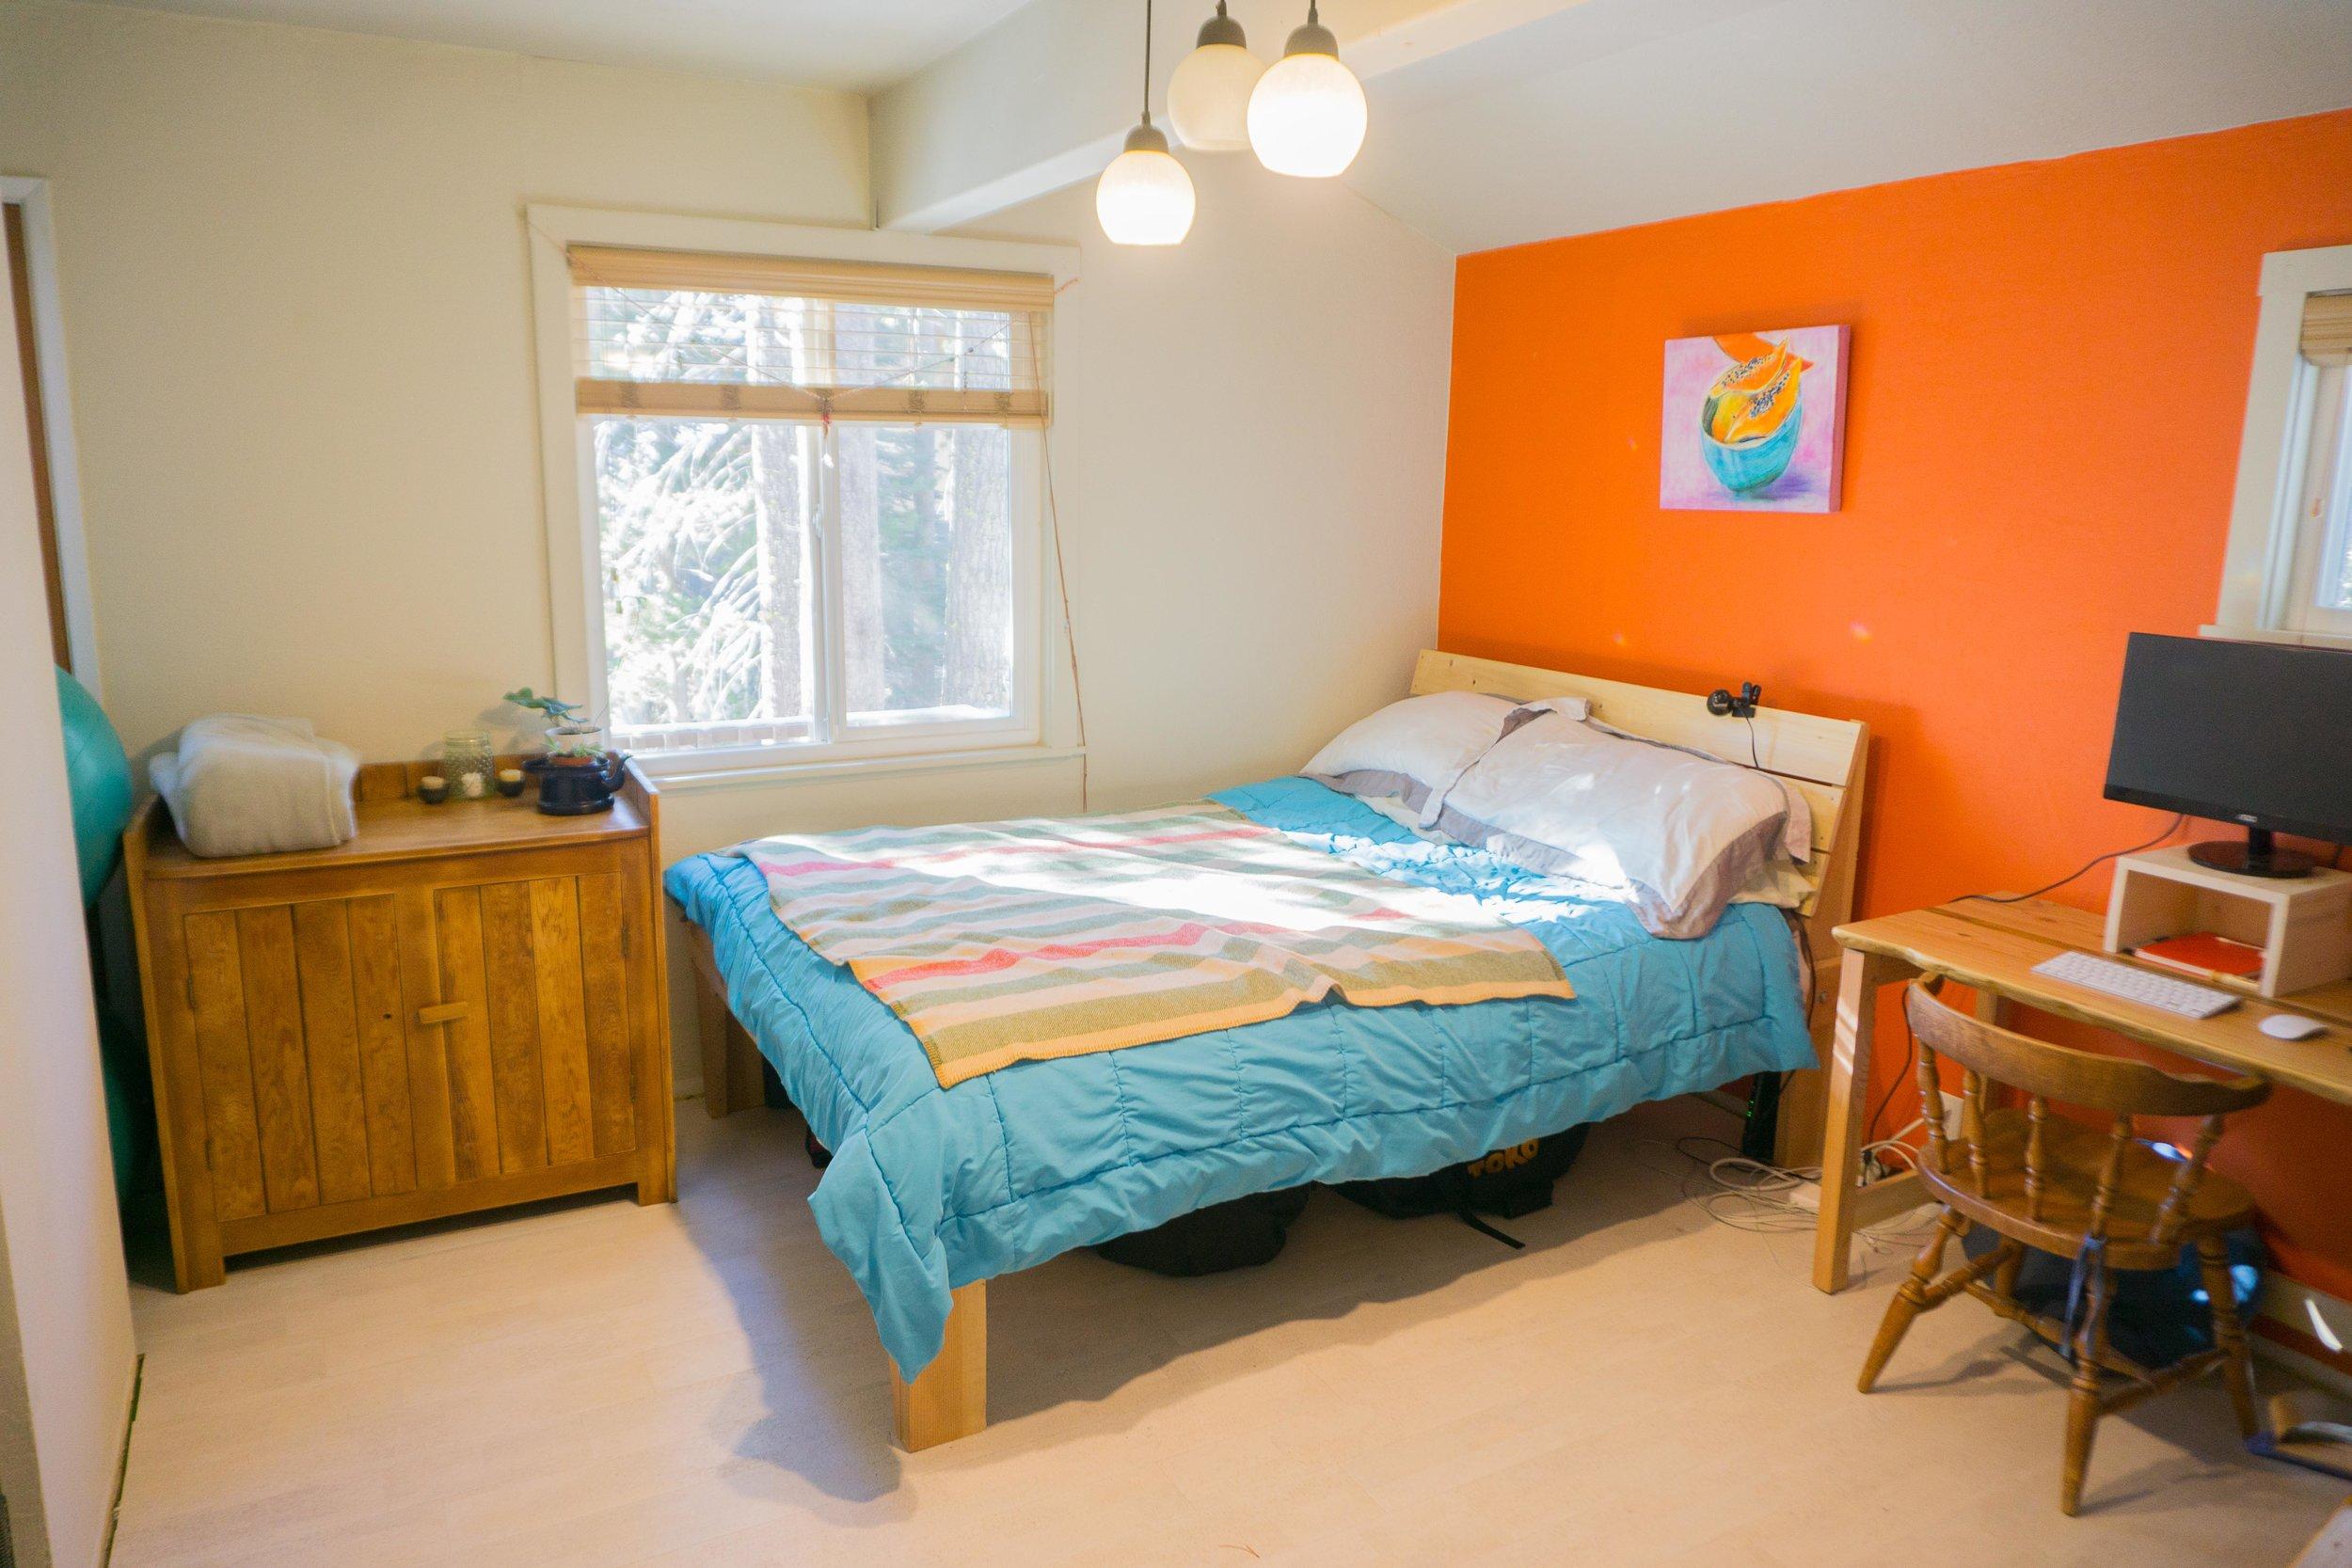 AirbnbHouse-05780.jpg